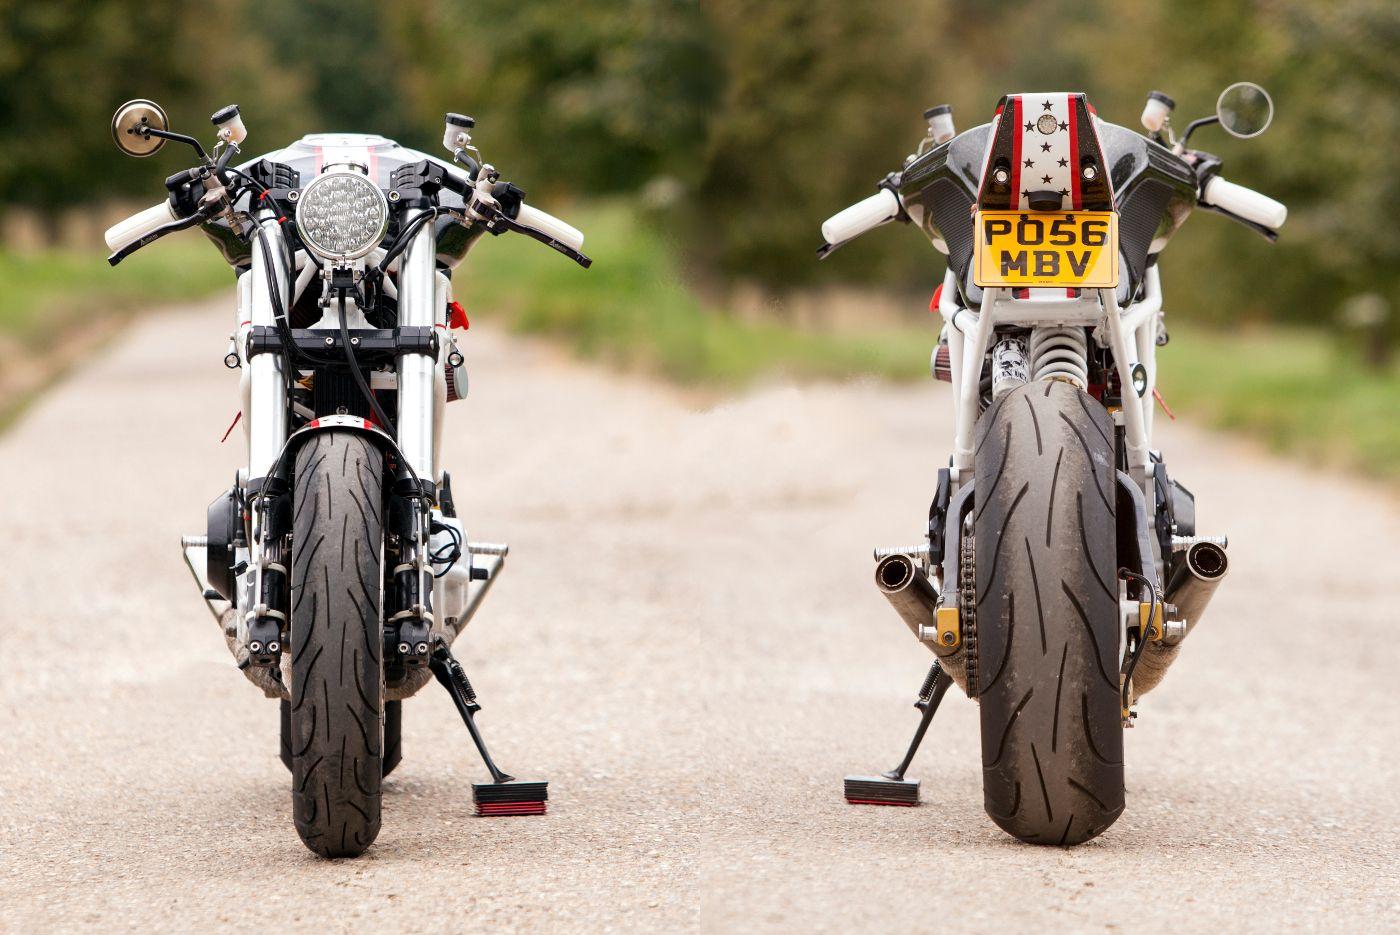 ducati monster 900 cafe racermario kusters | motorcycles